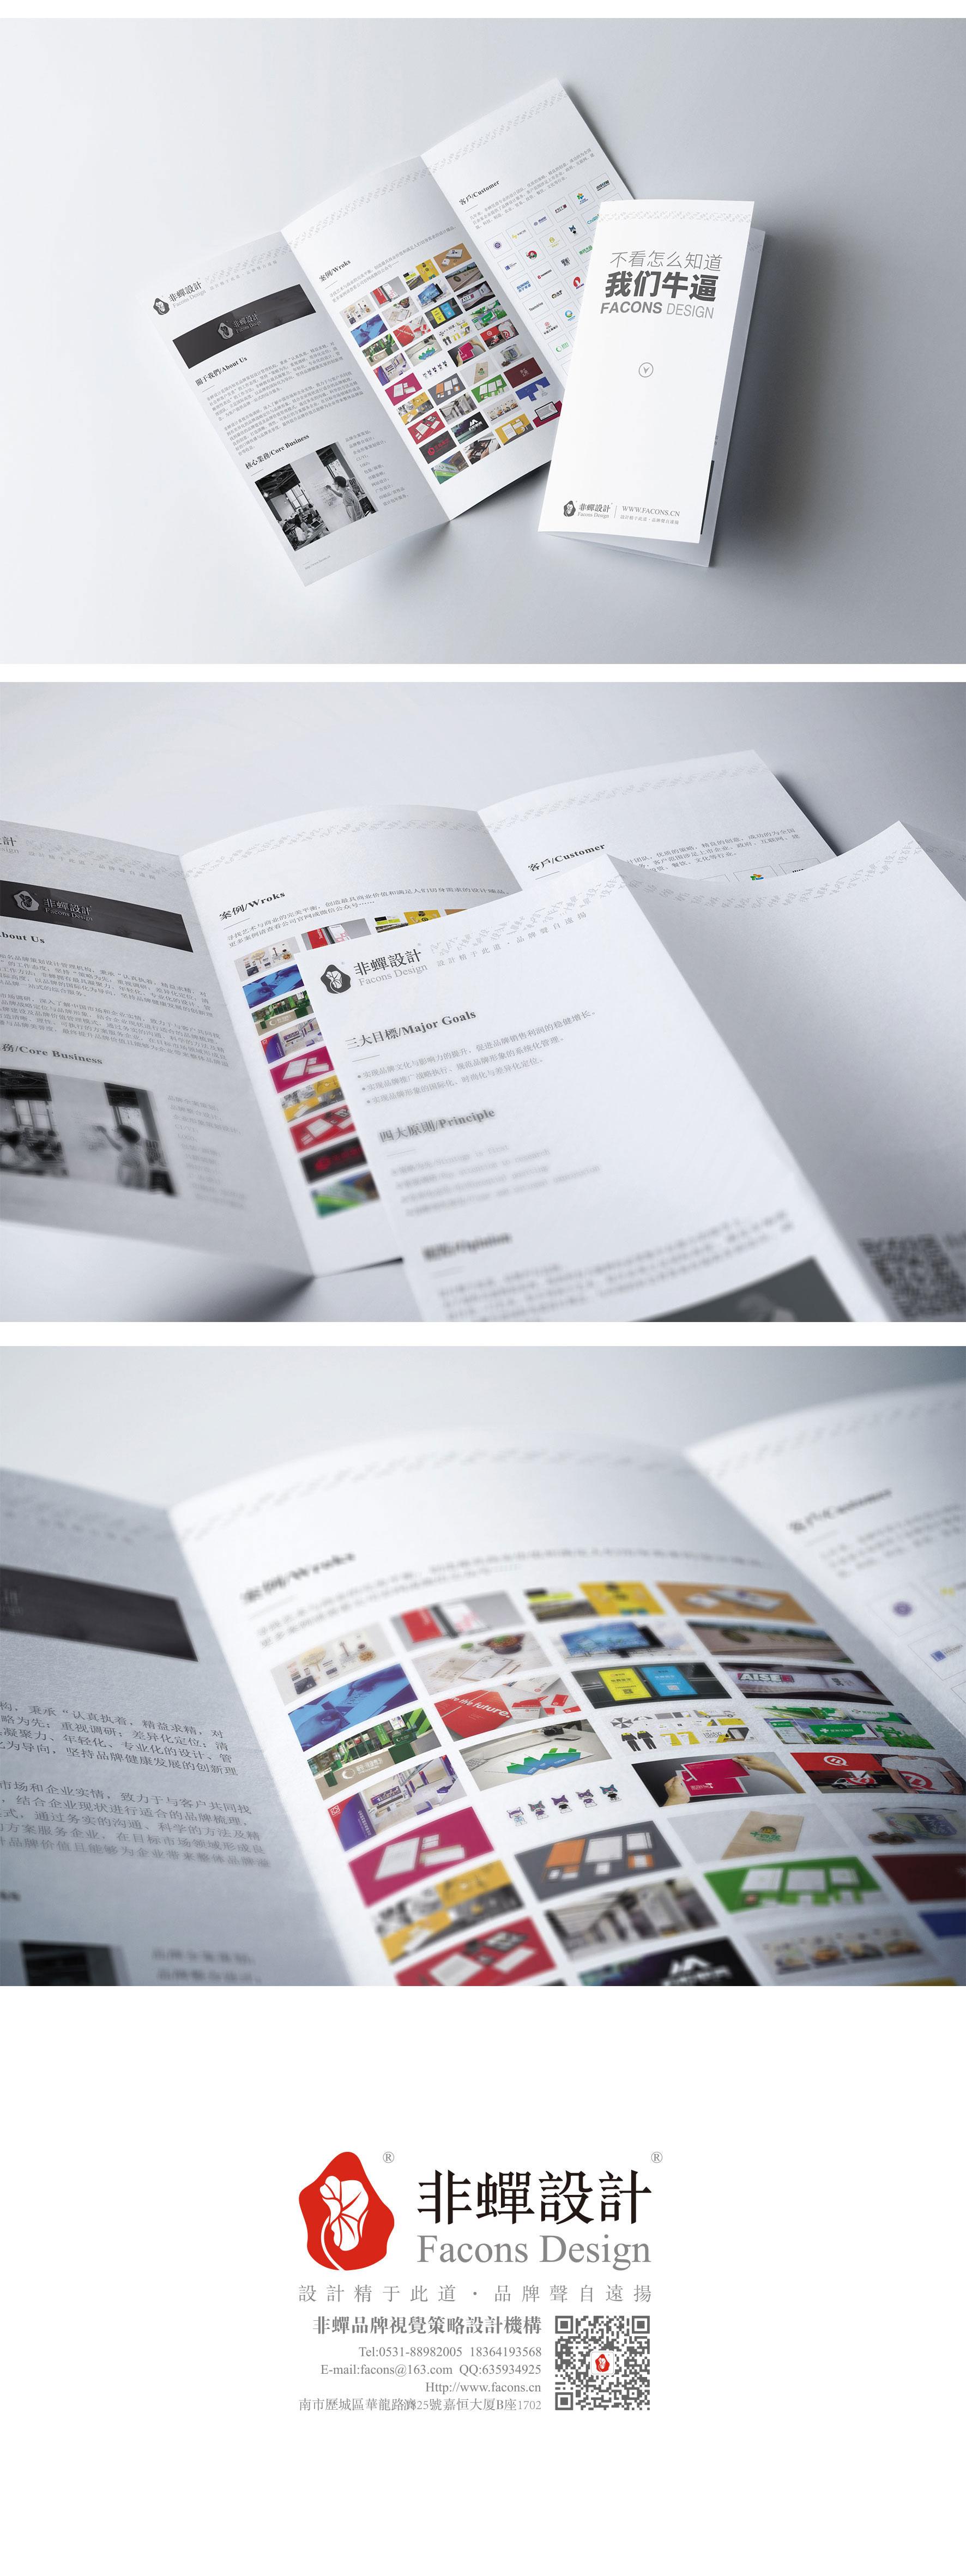 FaconsDesign 三折页设计